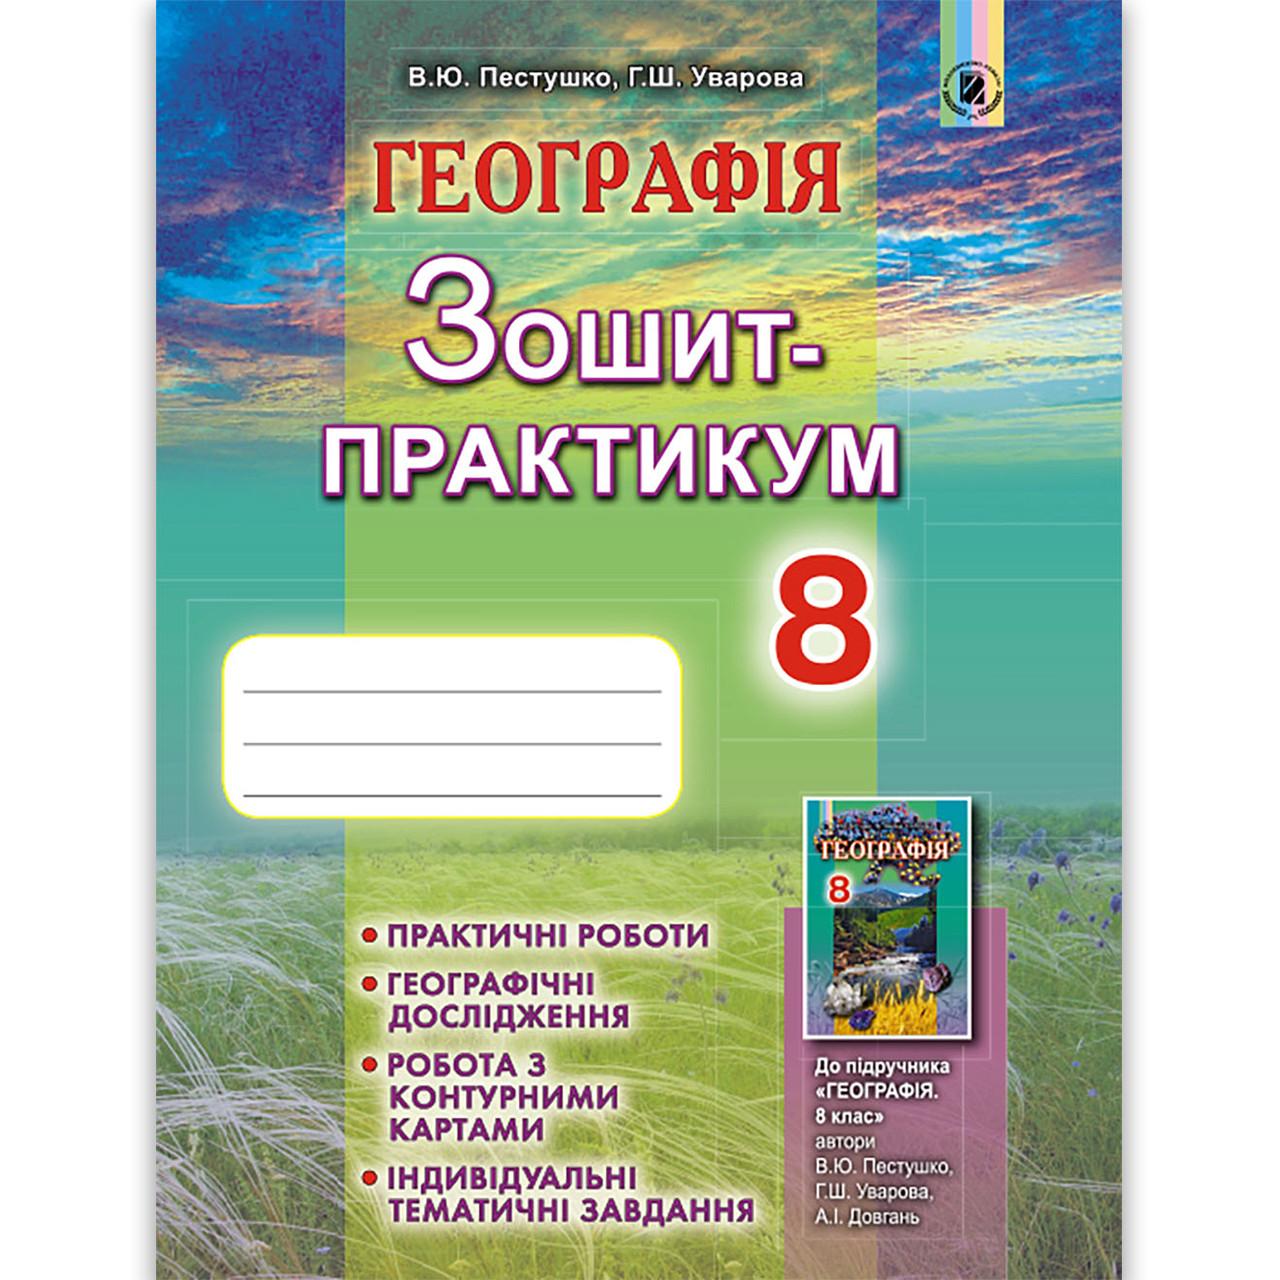 Зошит-практикум Географія 8 клас Авт: Пестушко В. Уварова Г. Вид: Генеза